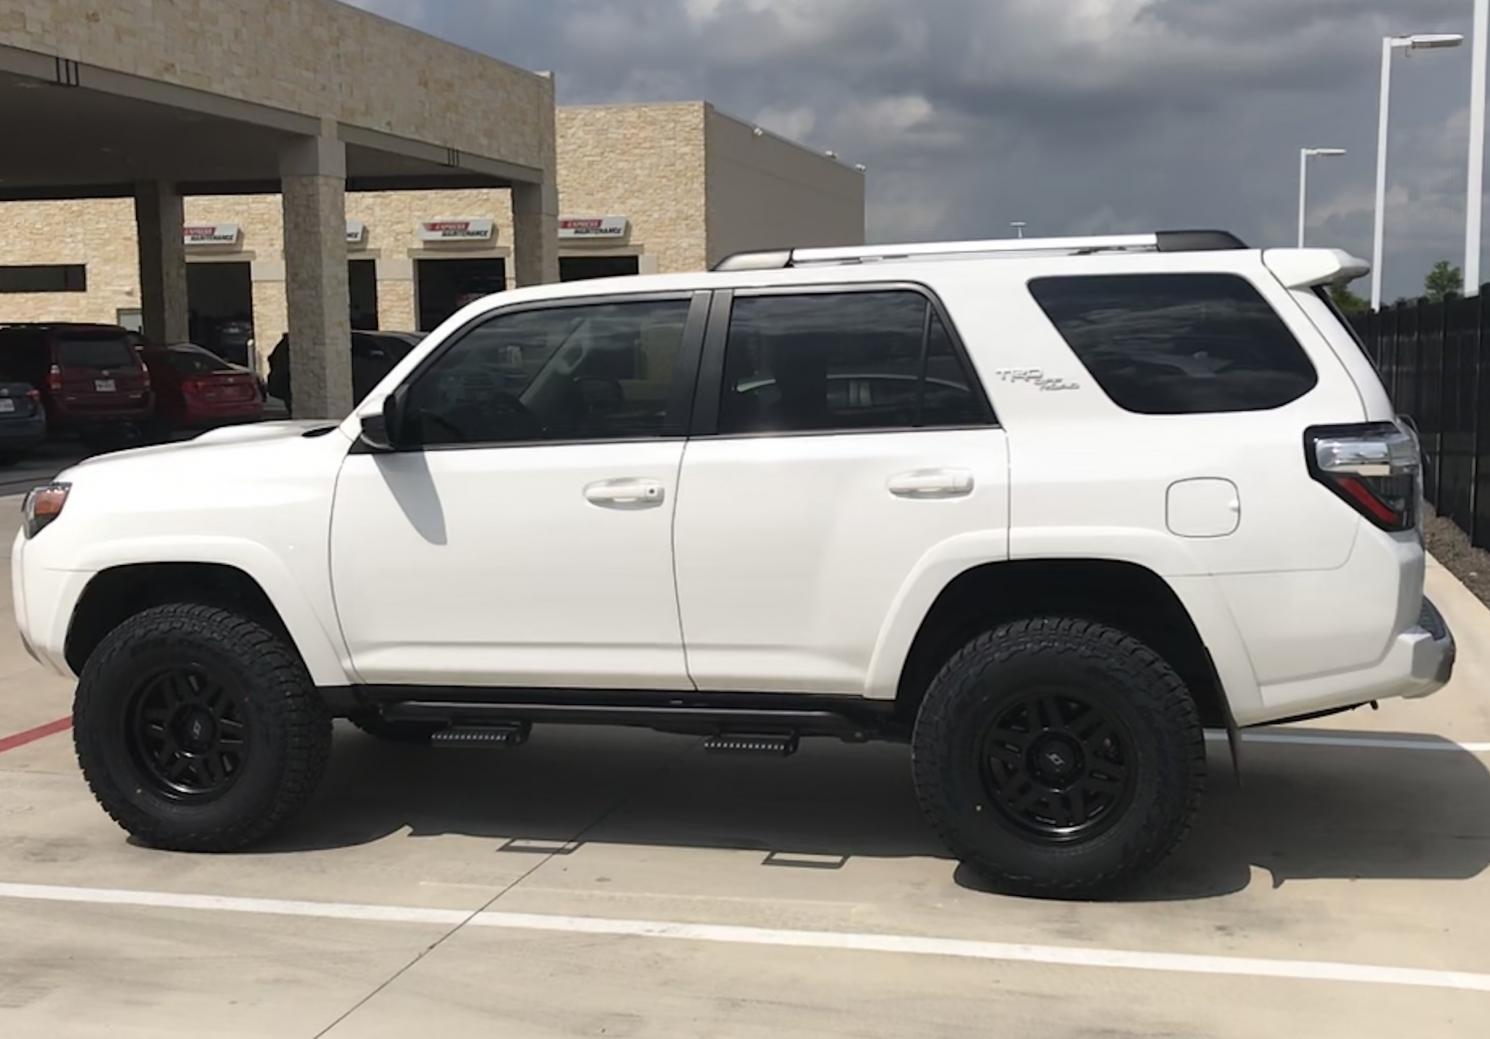 SCS Stealth 6 wheels 17x8.5-e65611a6-4b36-4700-875b-a65e6a0b3f56-jpg